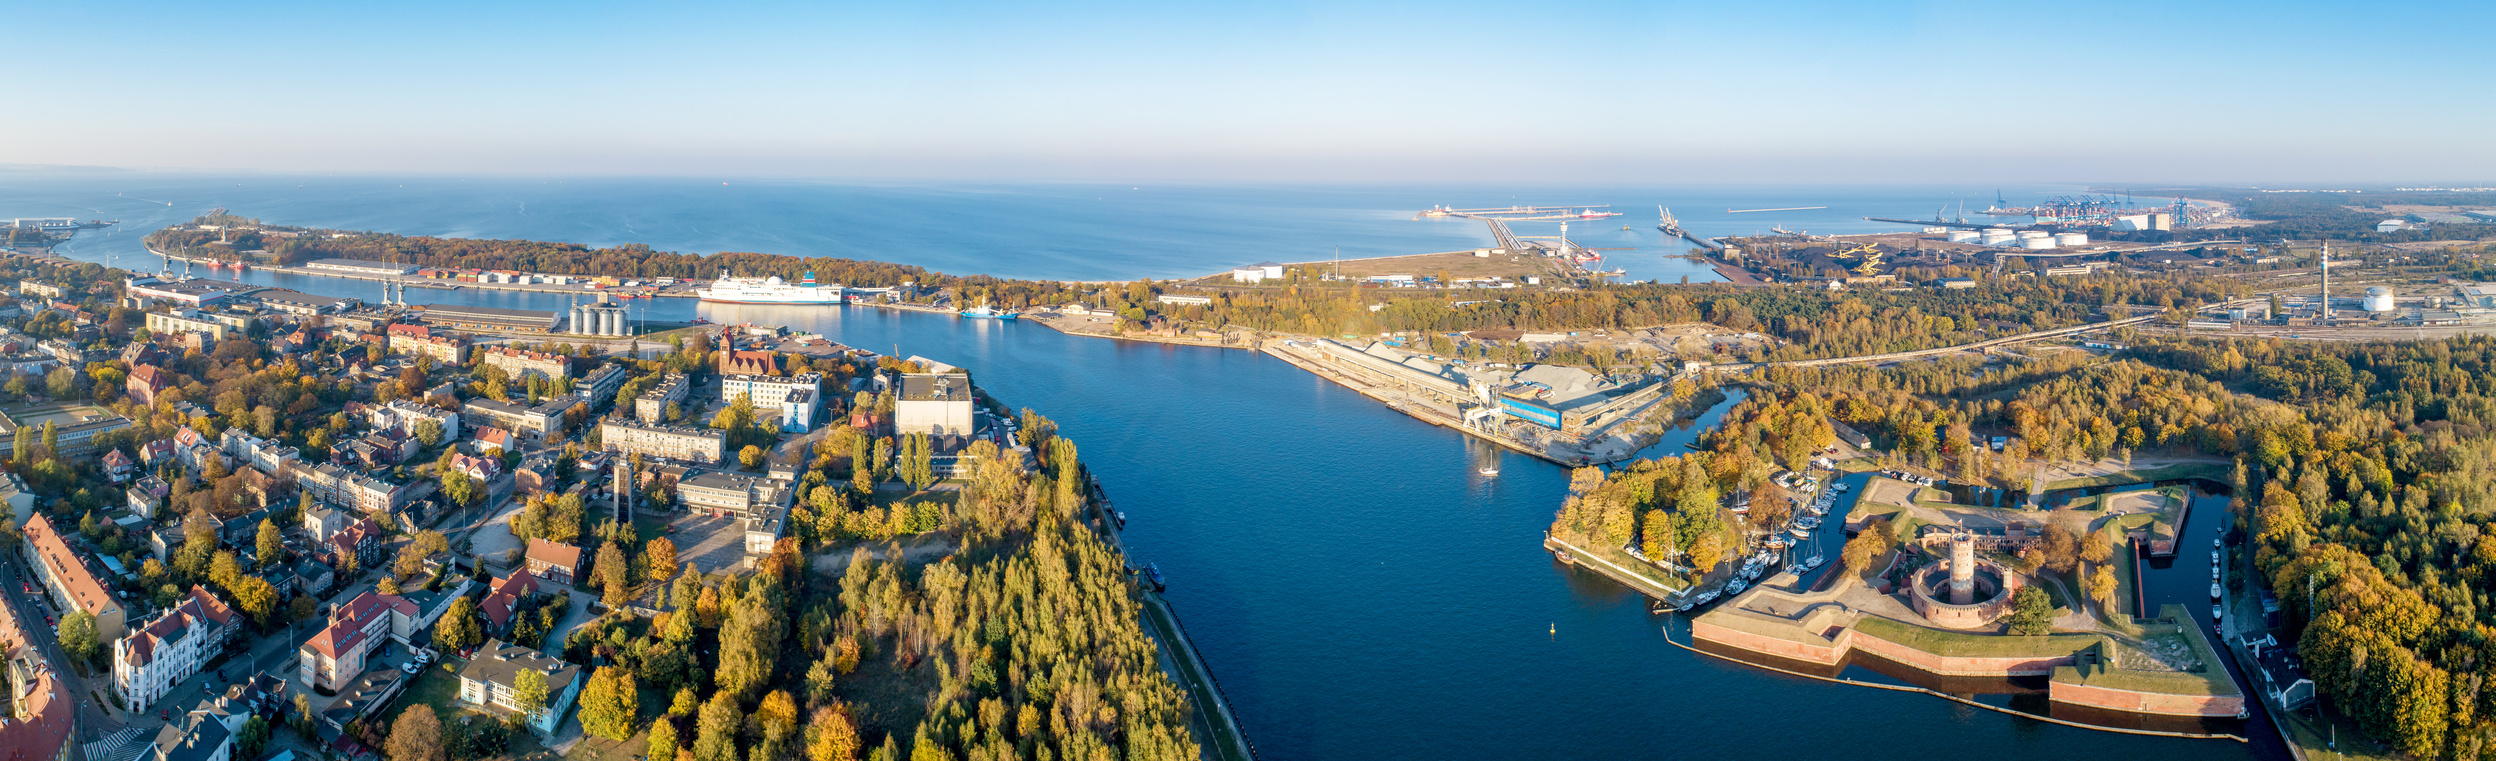 Litt om Westerplatte